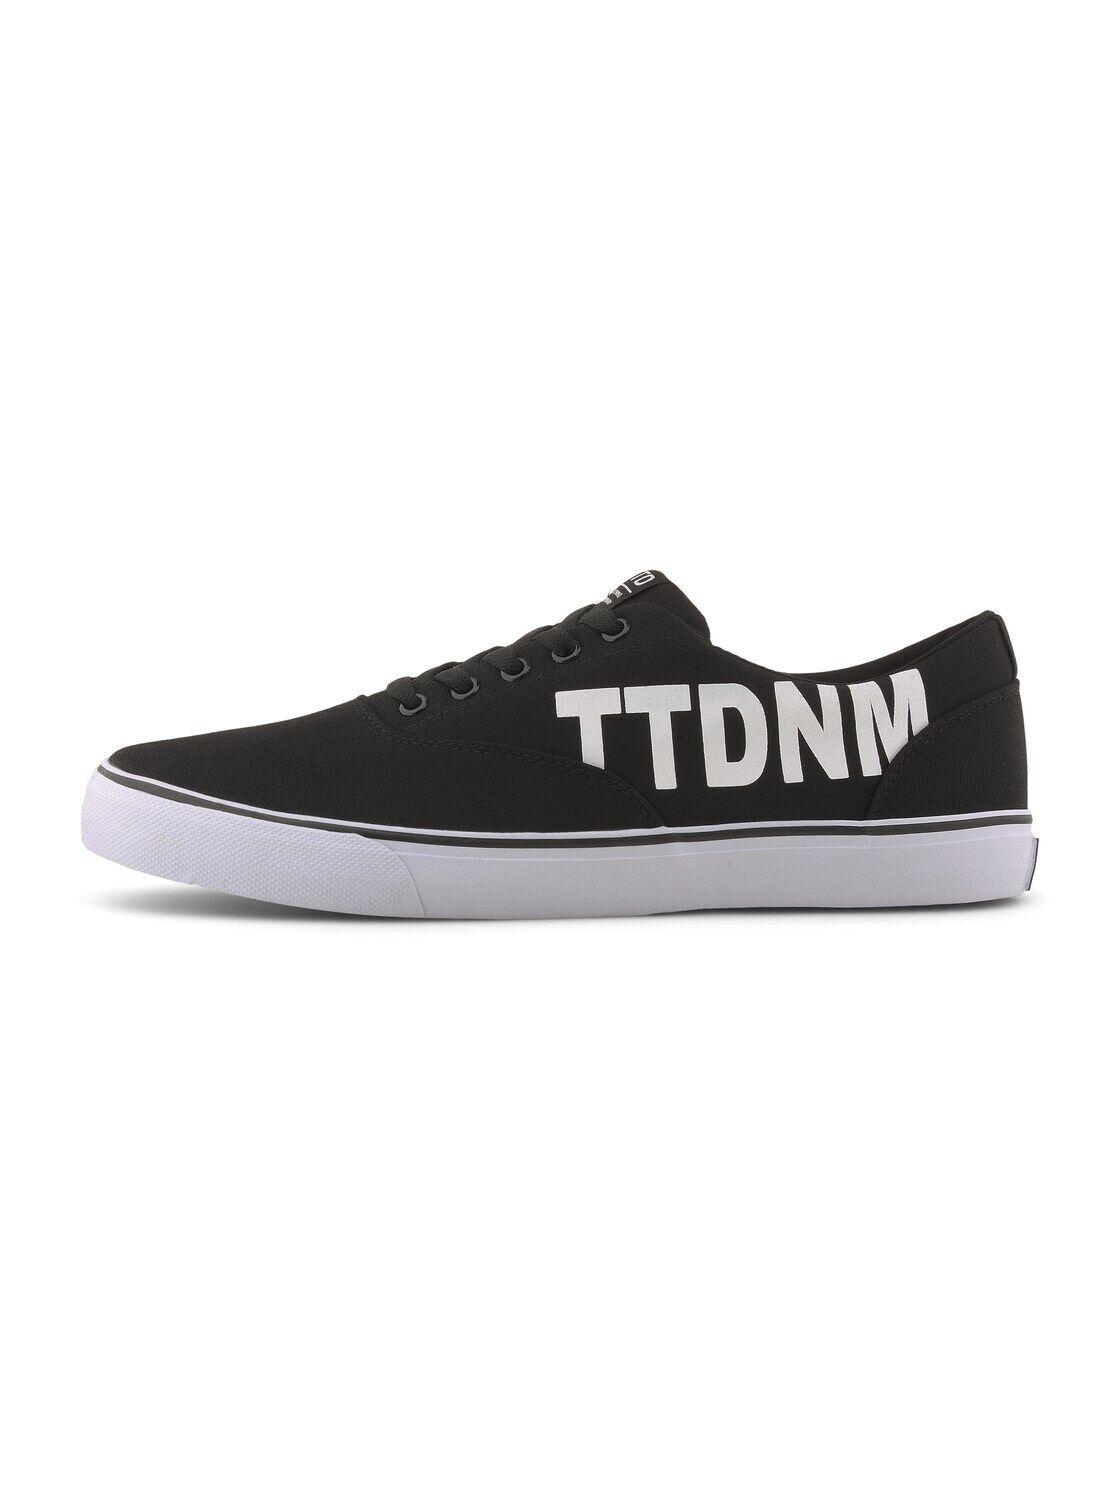 TOM TAILOR DENIM Herren Sneaker mit Logo-Print, schwarz, Gr.44